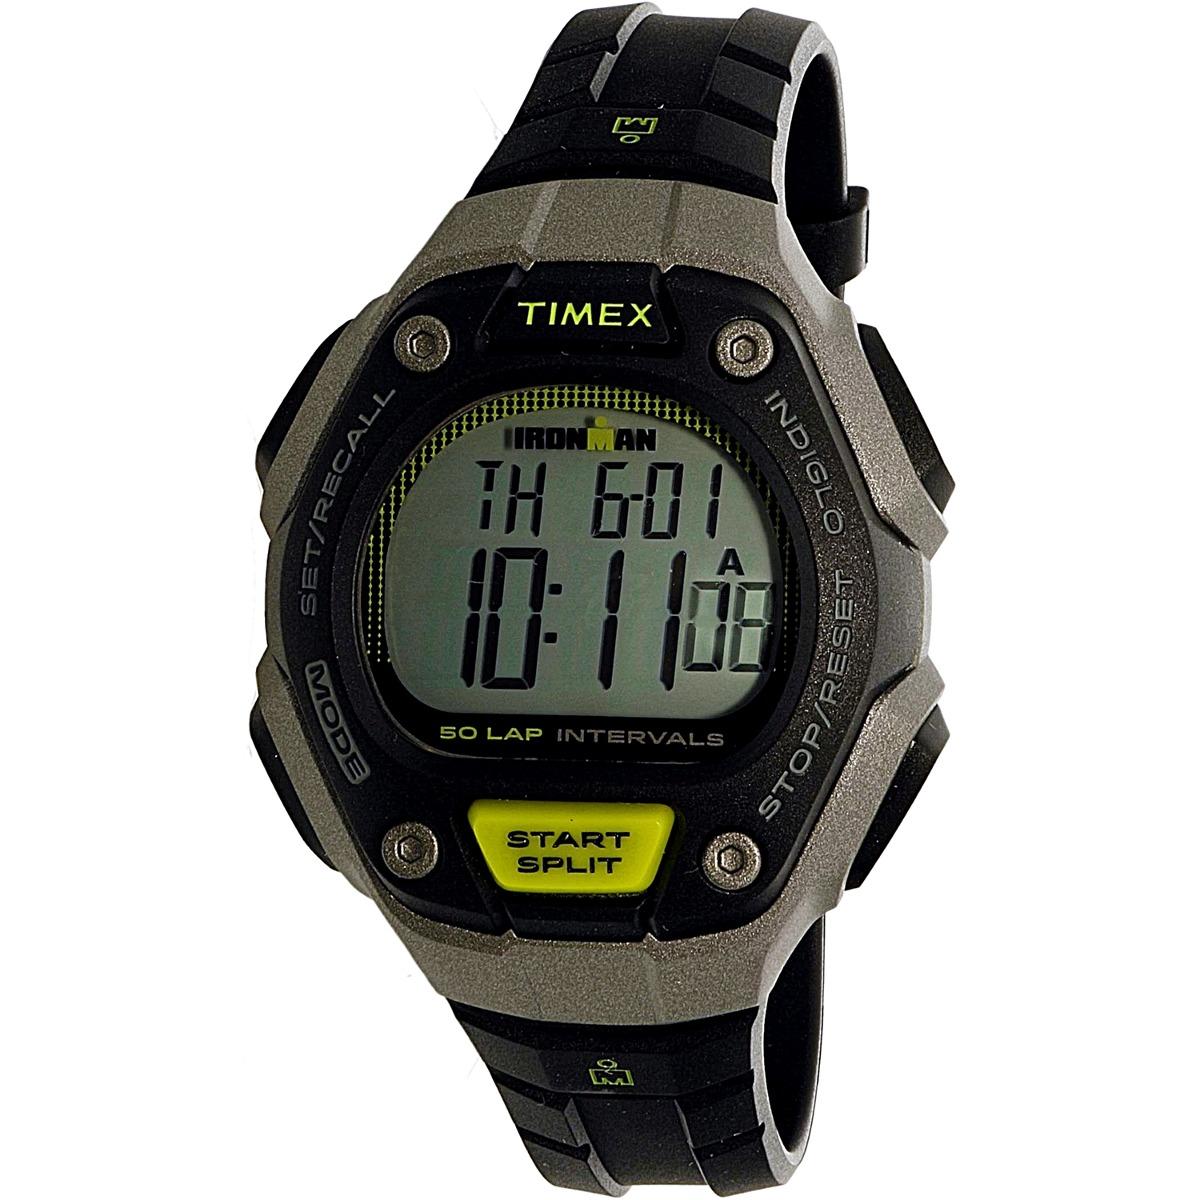 30ffb41937b3 Reloj Timex Para Hombre Tw5k93200 Poliuretano Deportivo -   2.550